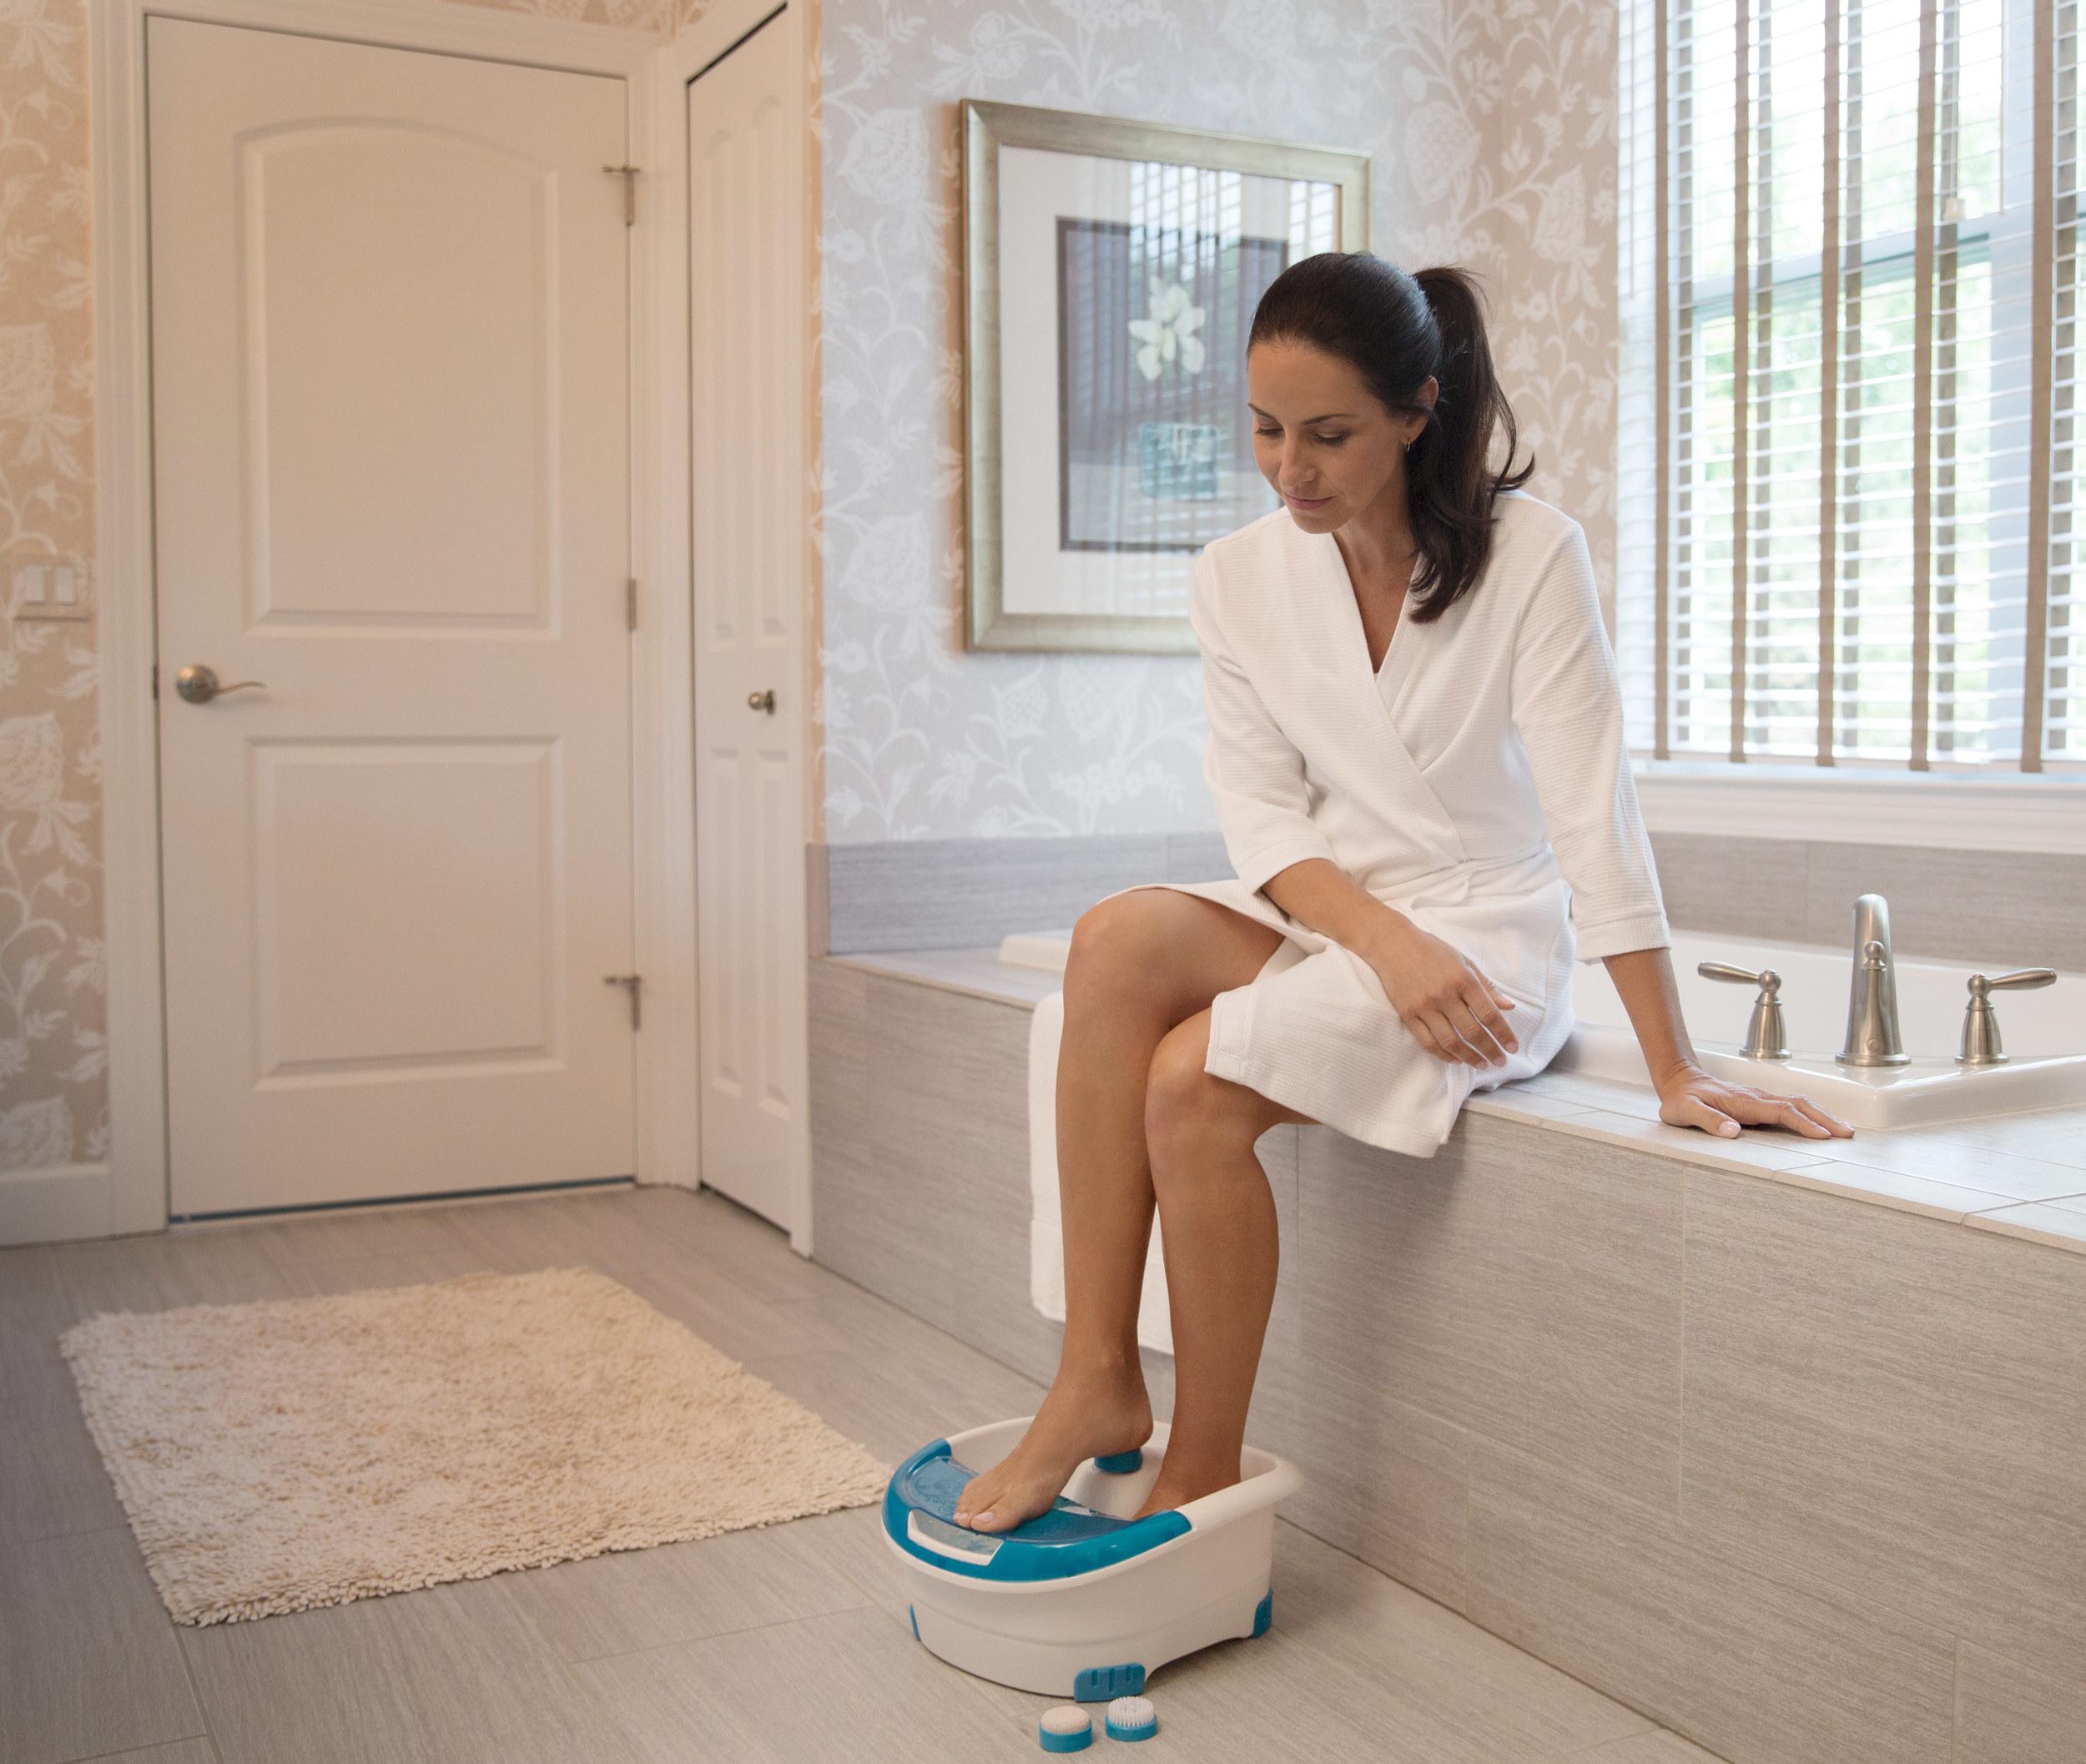 person using a pedicure footbath to soak their feet